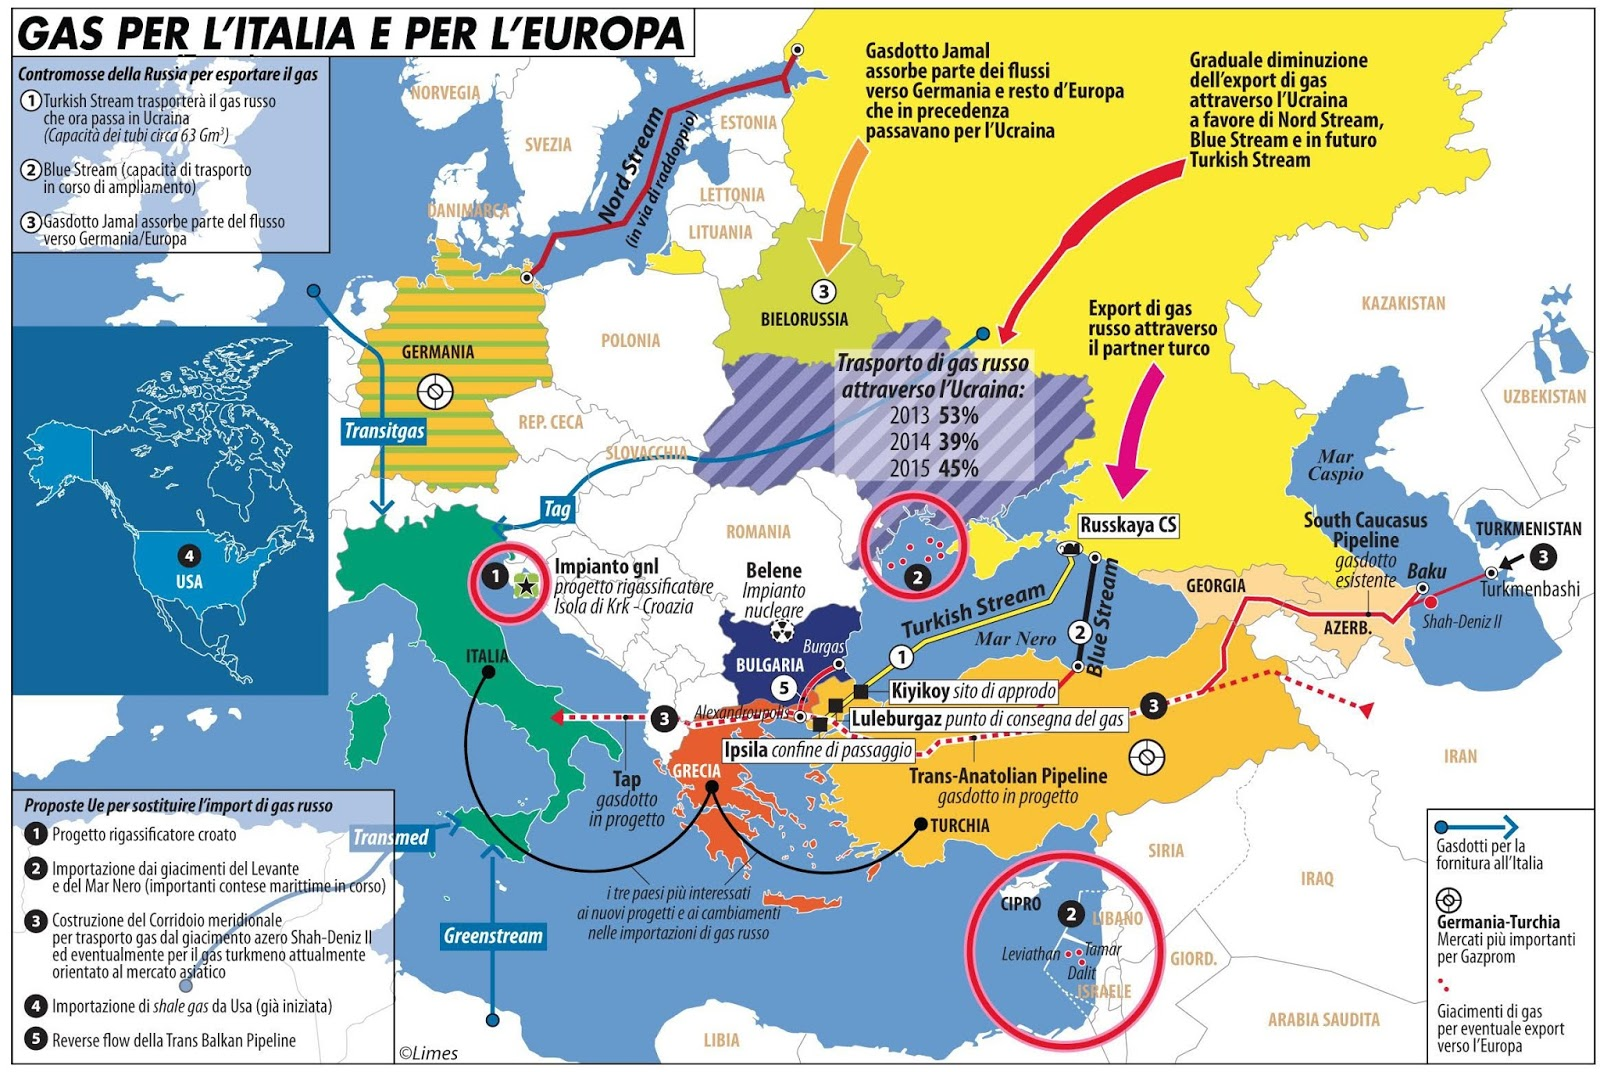 Limes club trieste gas ed energia per l 39 europa una - Mappa di ungheria ed europa ...